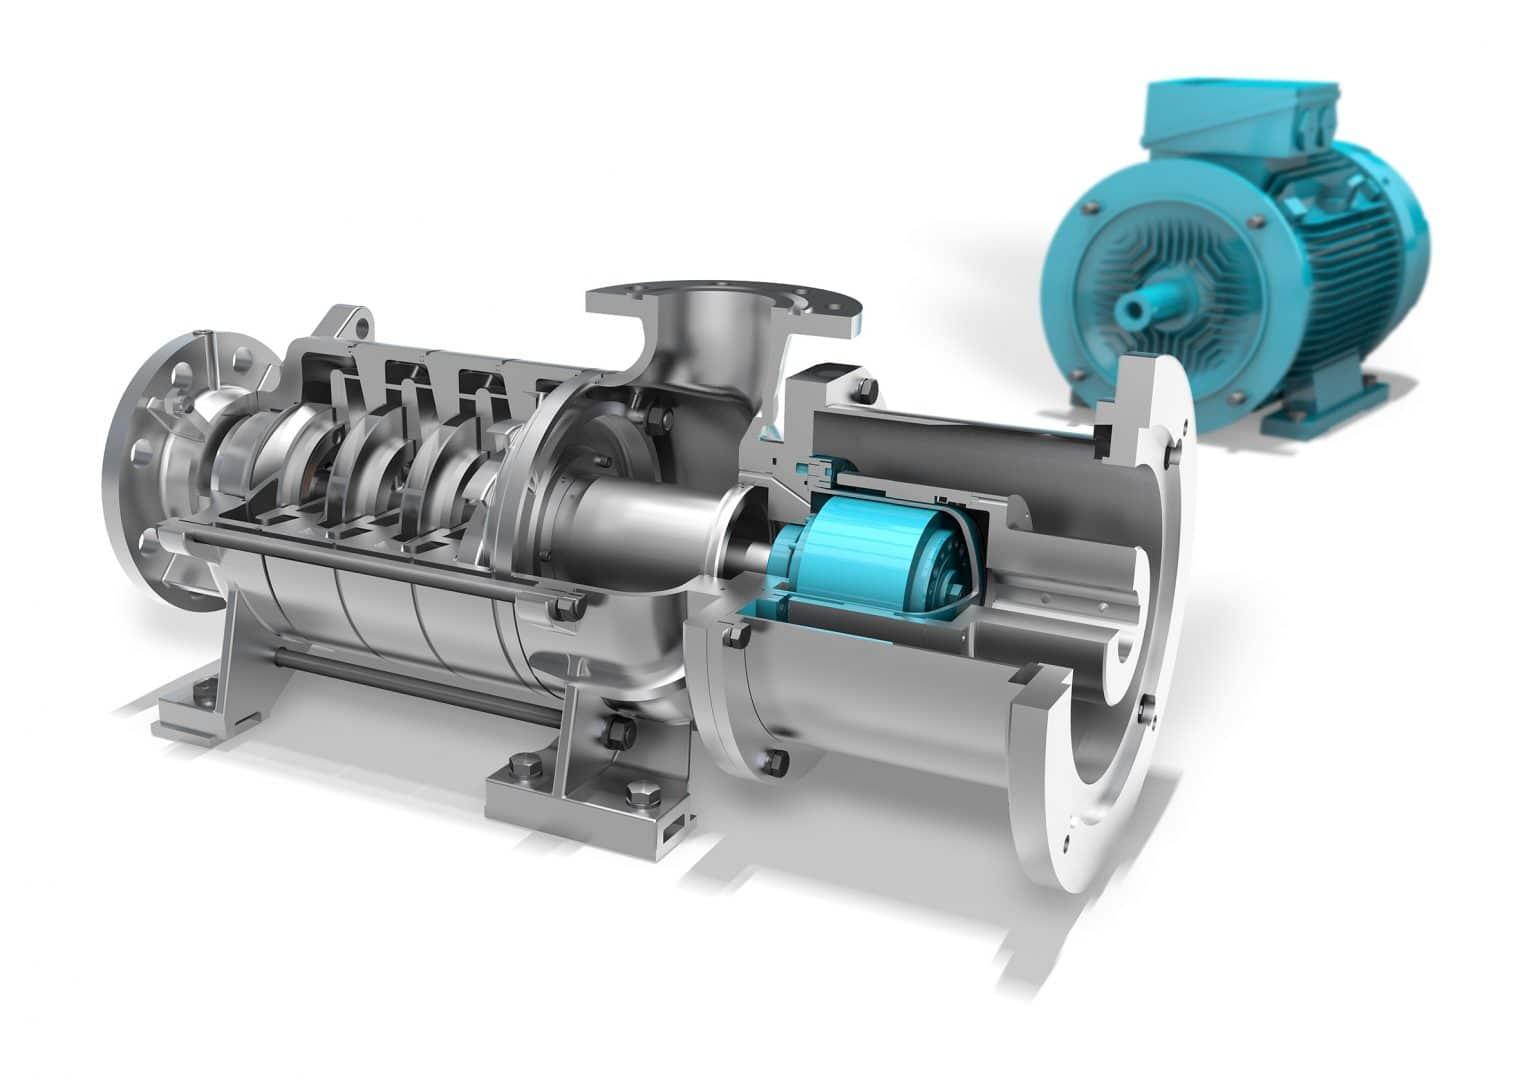 EDUR refrigerant pump uses magnetic couplings